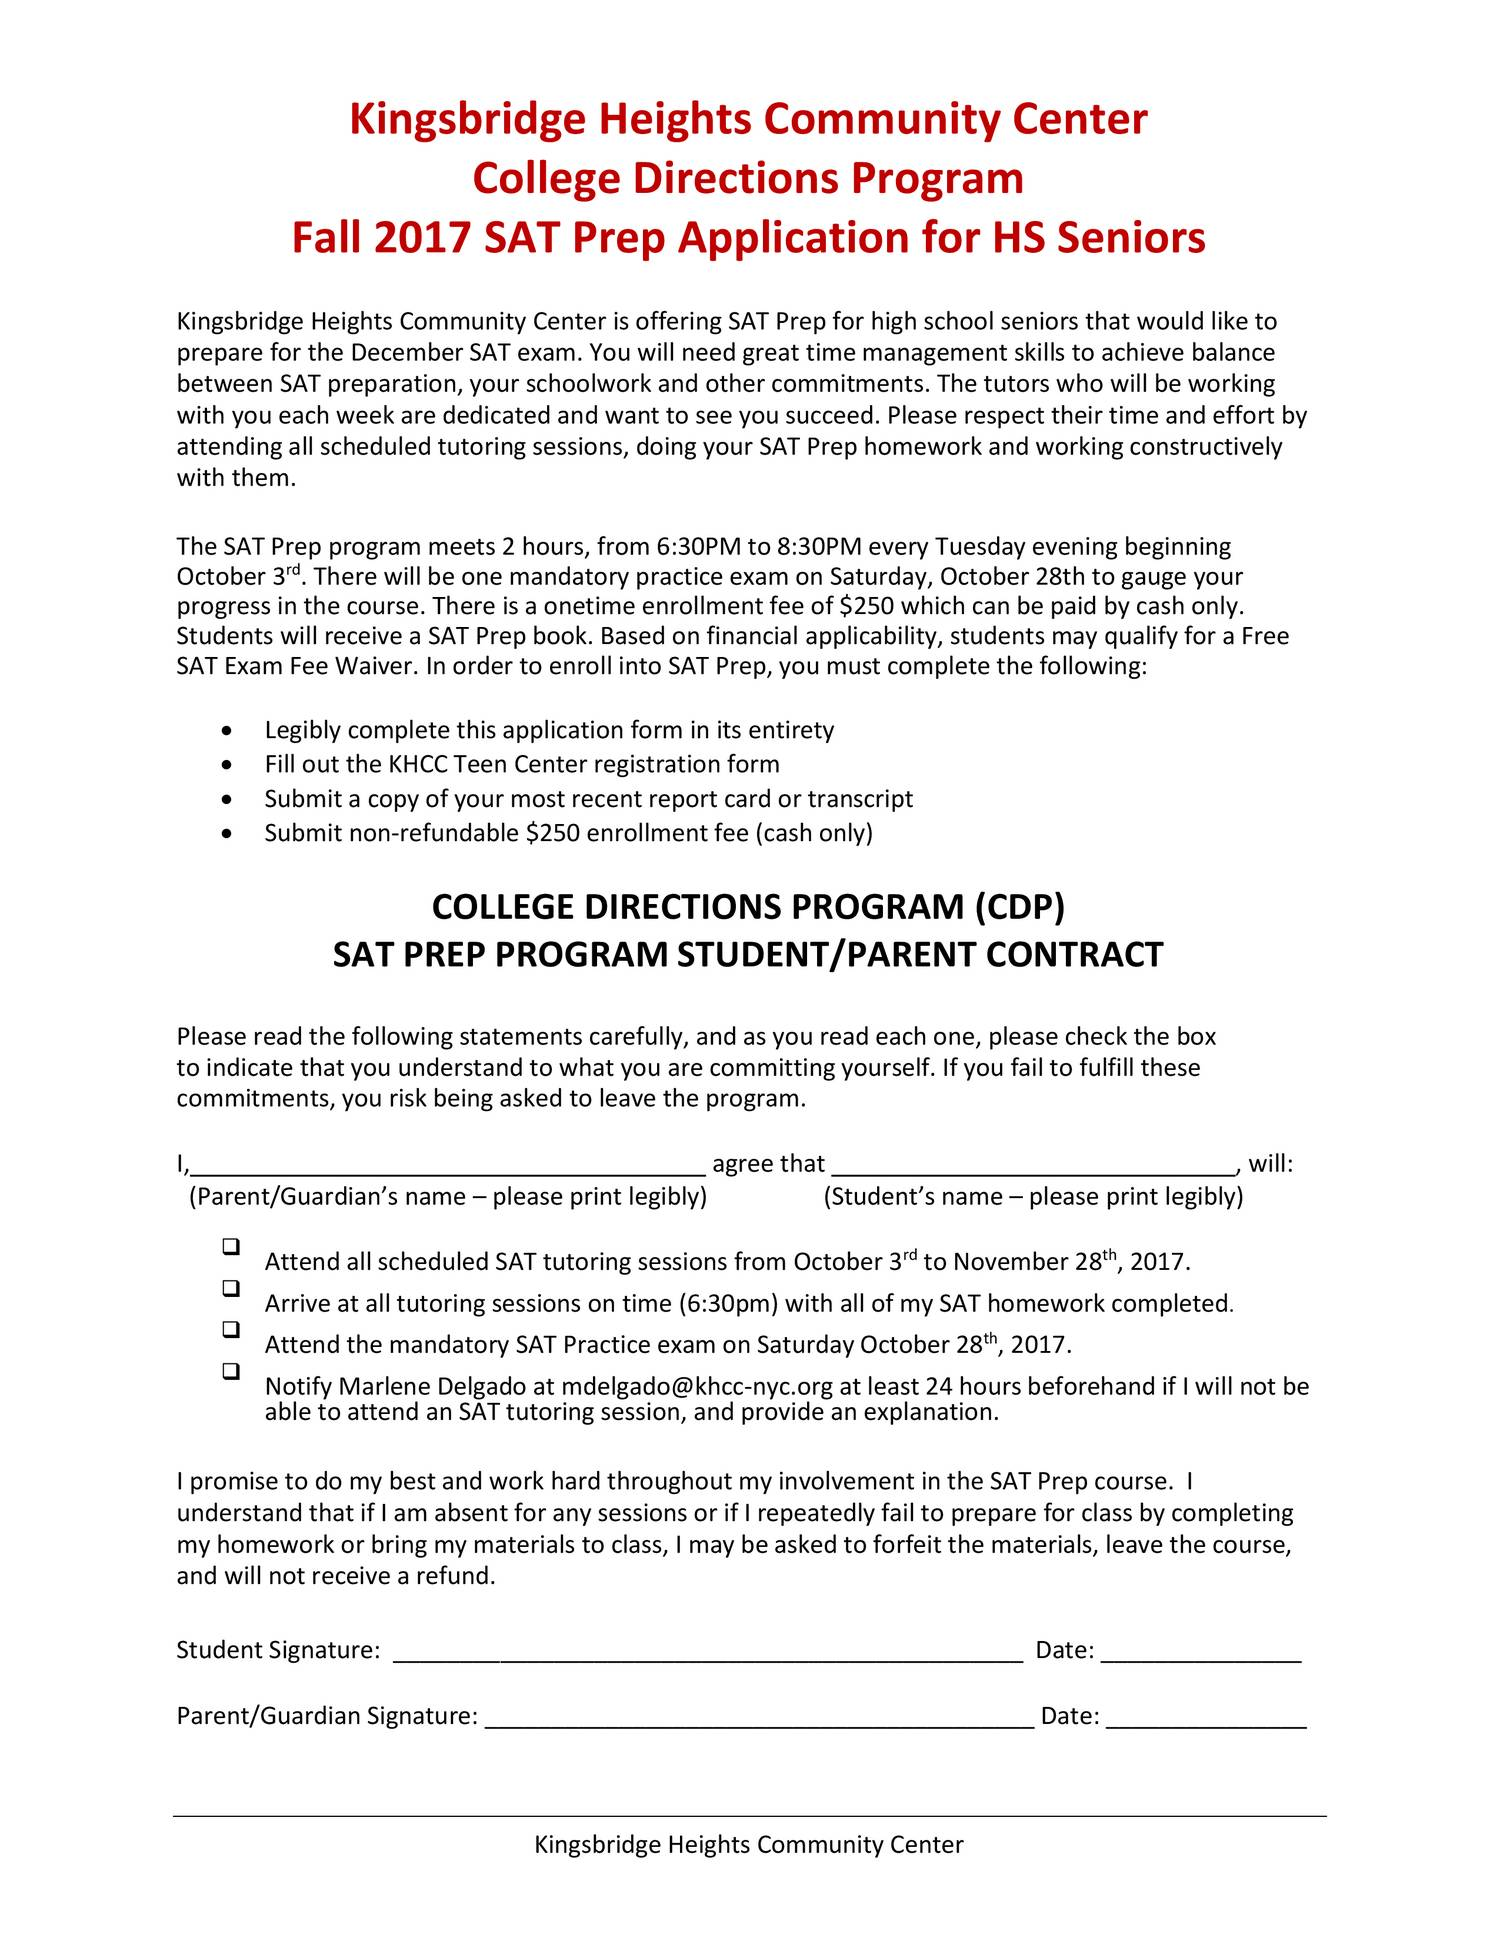 Teen center enrollment form are